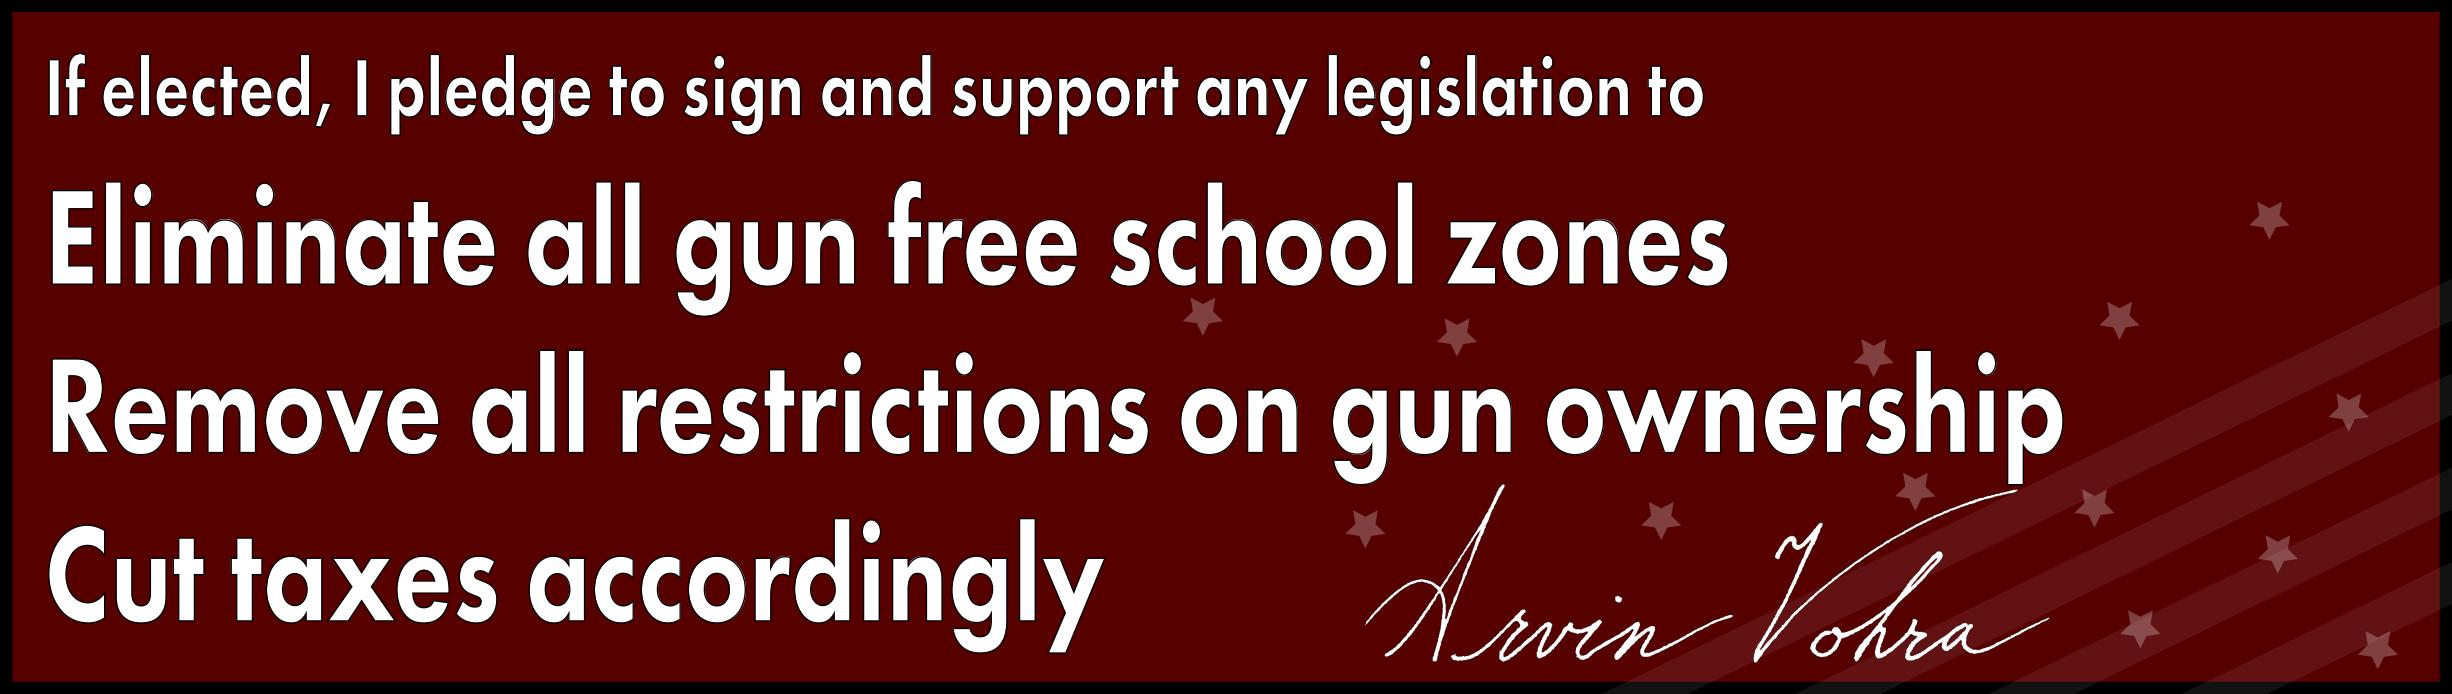 Guns Pledge for Pres.png